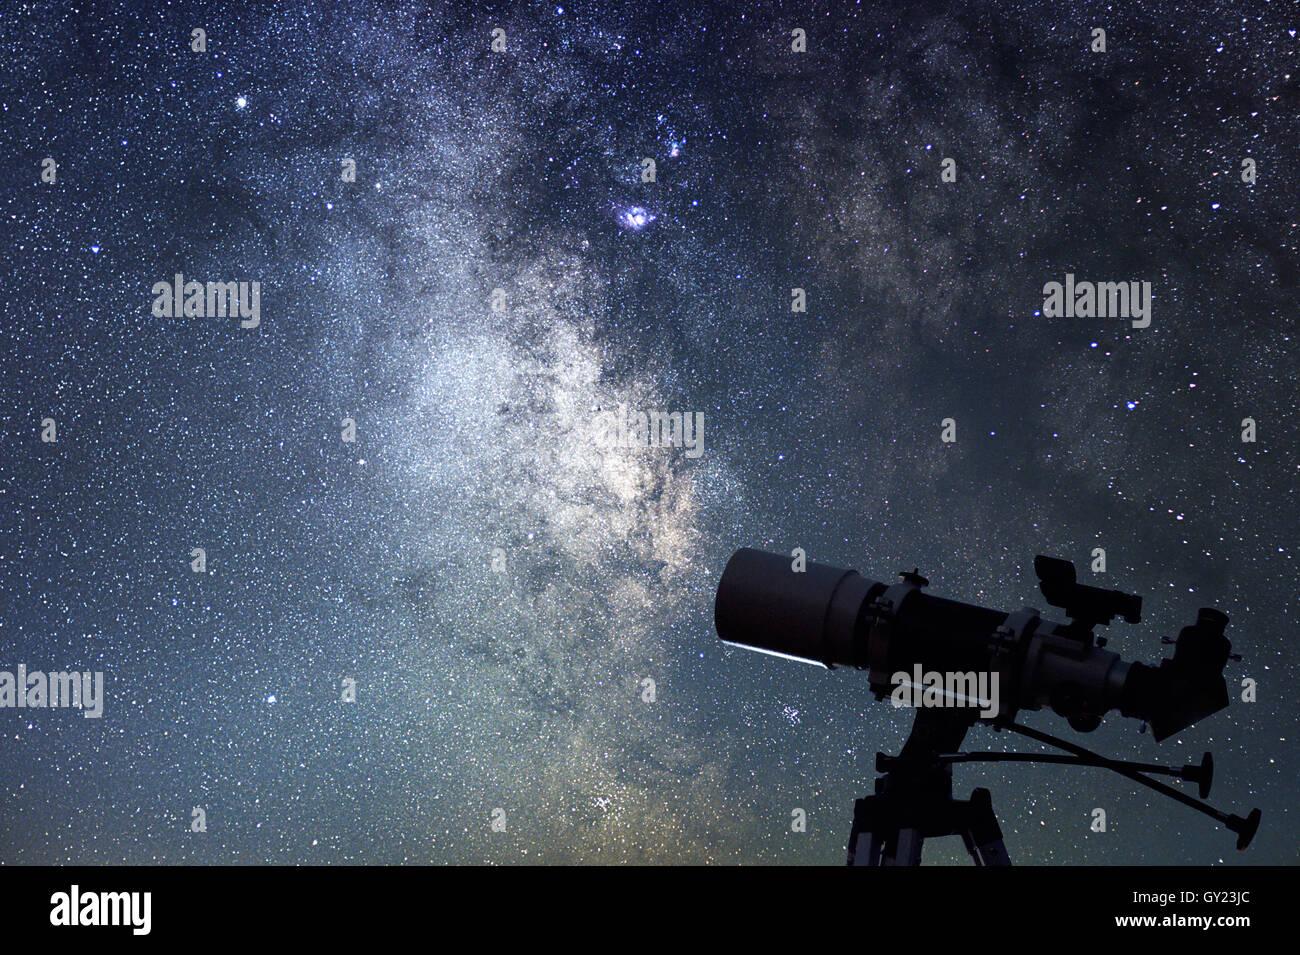 Teleskop astronomi: teleskop skywatcher skyhawk p eq newton intercon